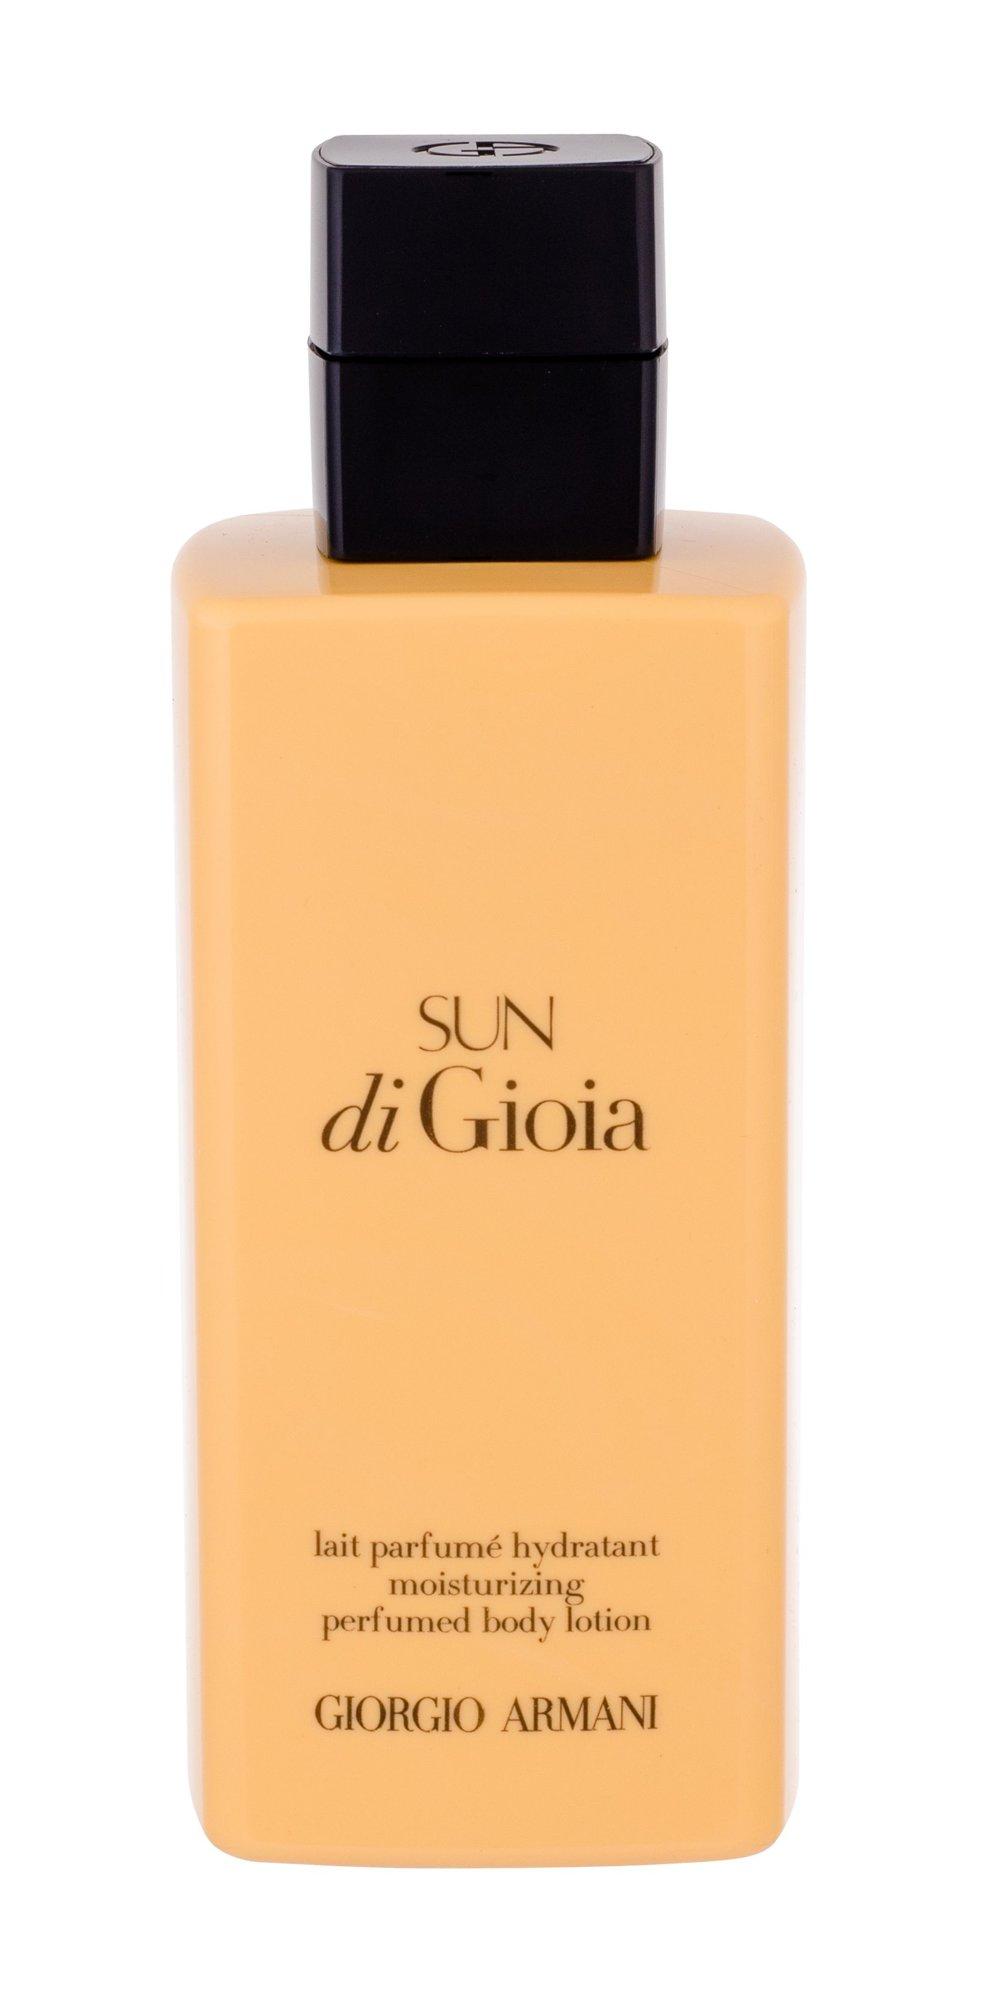 Giorgio Armani Sun di Gioia, Tělové mléko 200ml